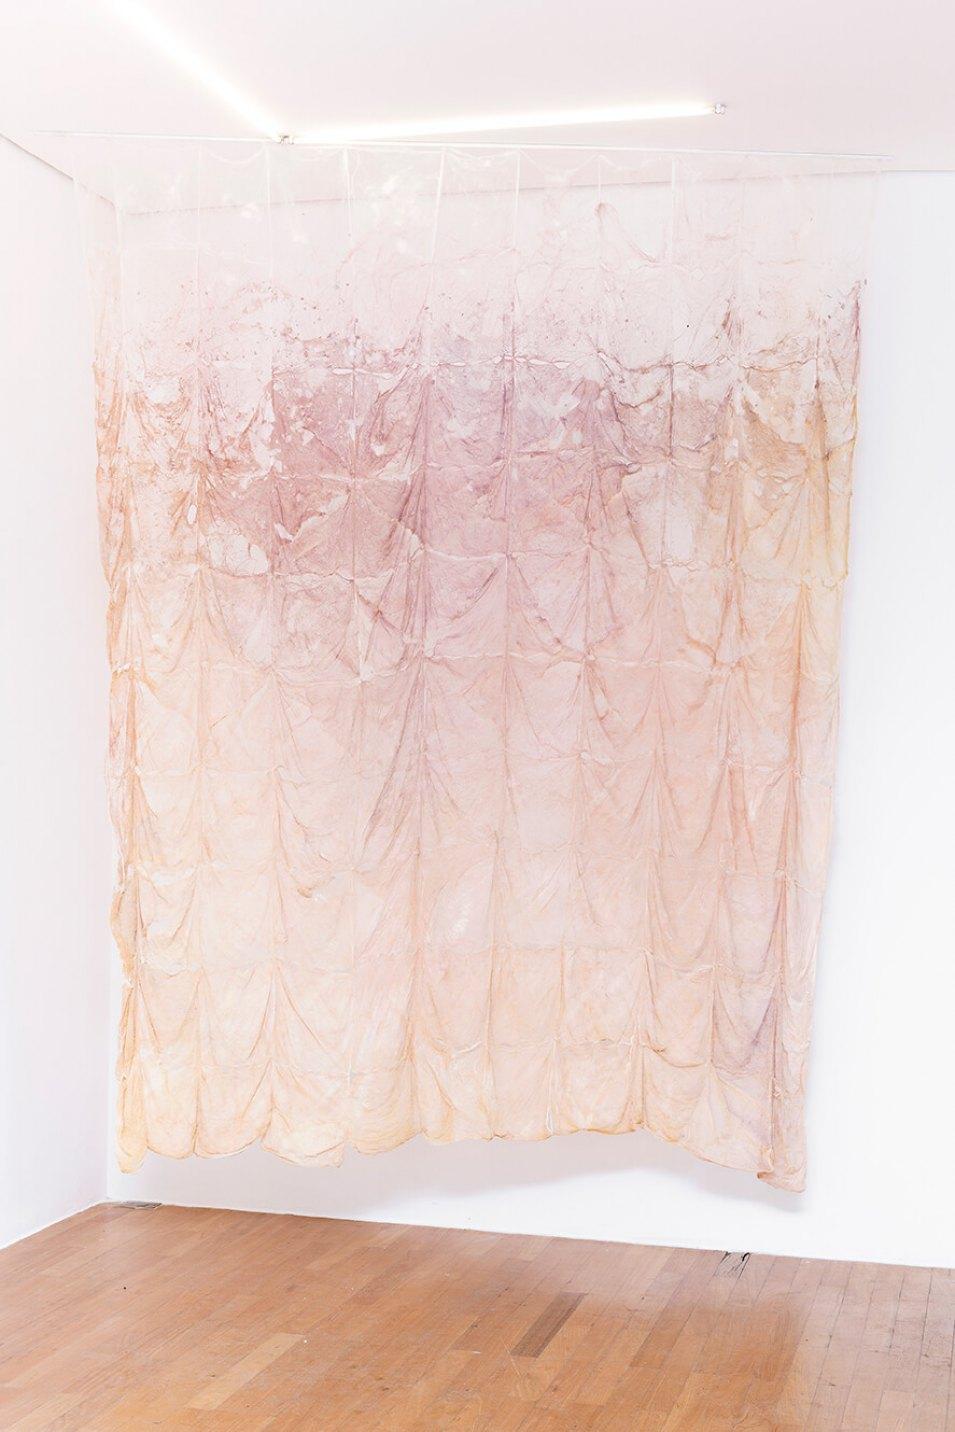 Adriano Amaral, <em>untitled</em>,2015,silk, spray paint, thread and aluminum bar,270 × 220 cm - Mendes Wood DM